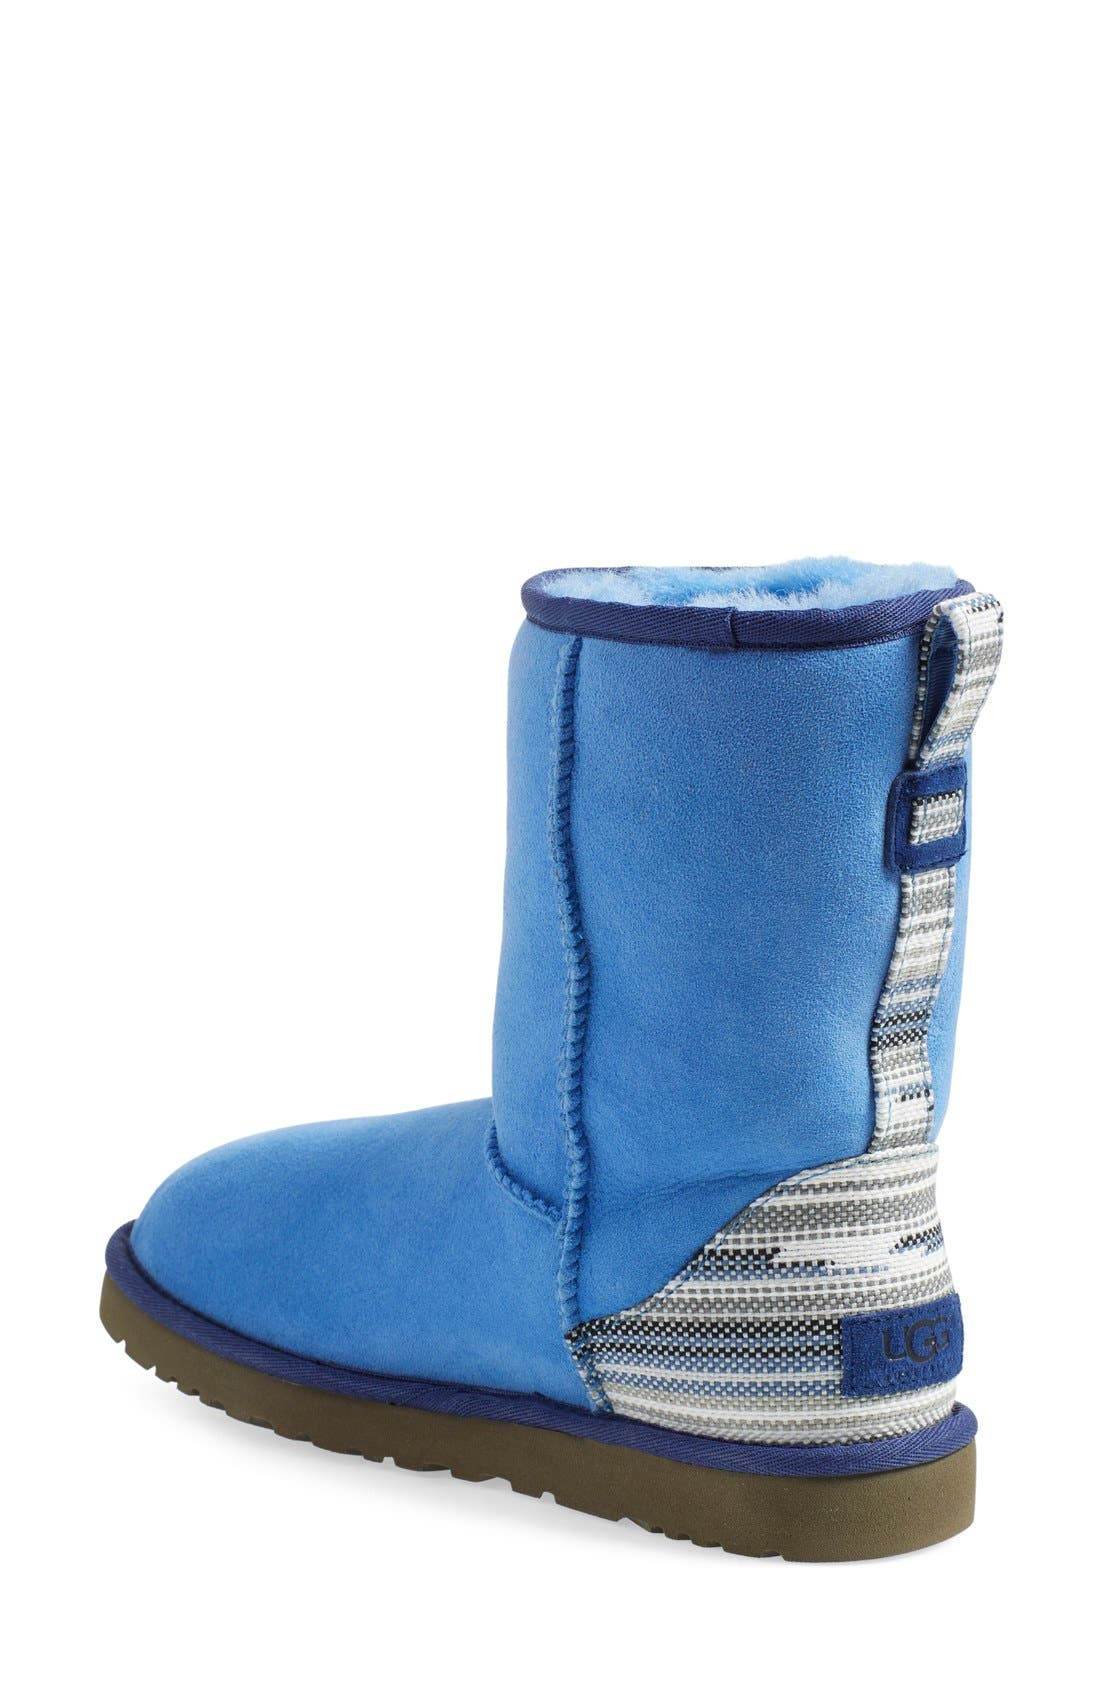 Alternate Image 2  - UGG® 'Classic Short - Serape' Water Resistant Boot (Women)